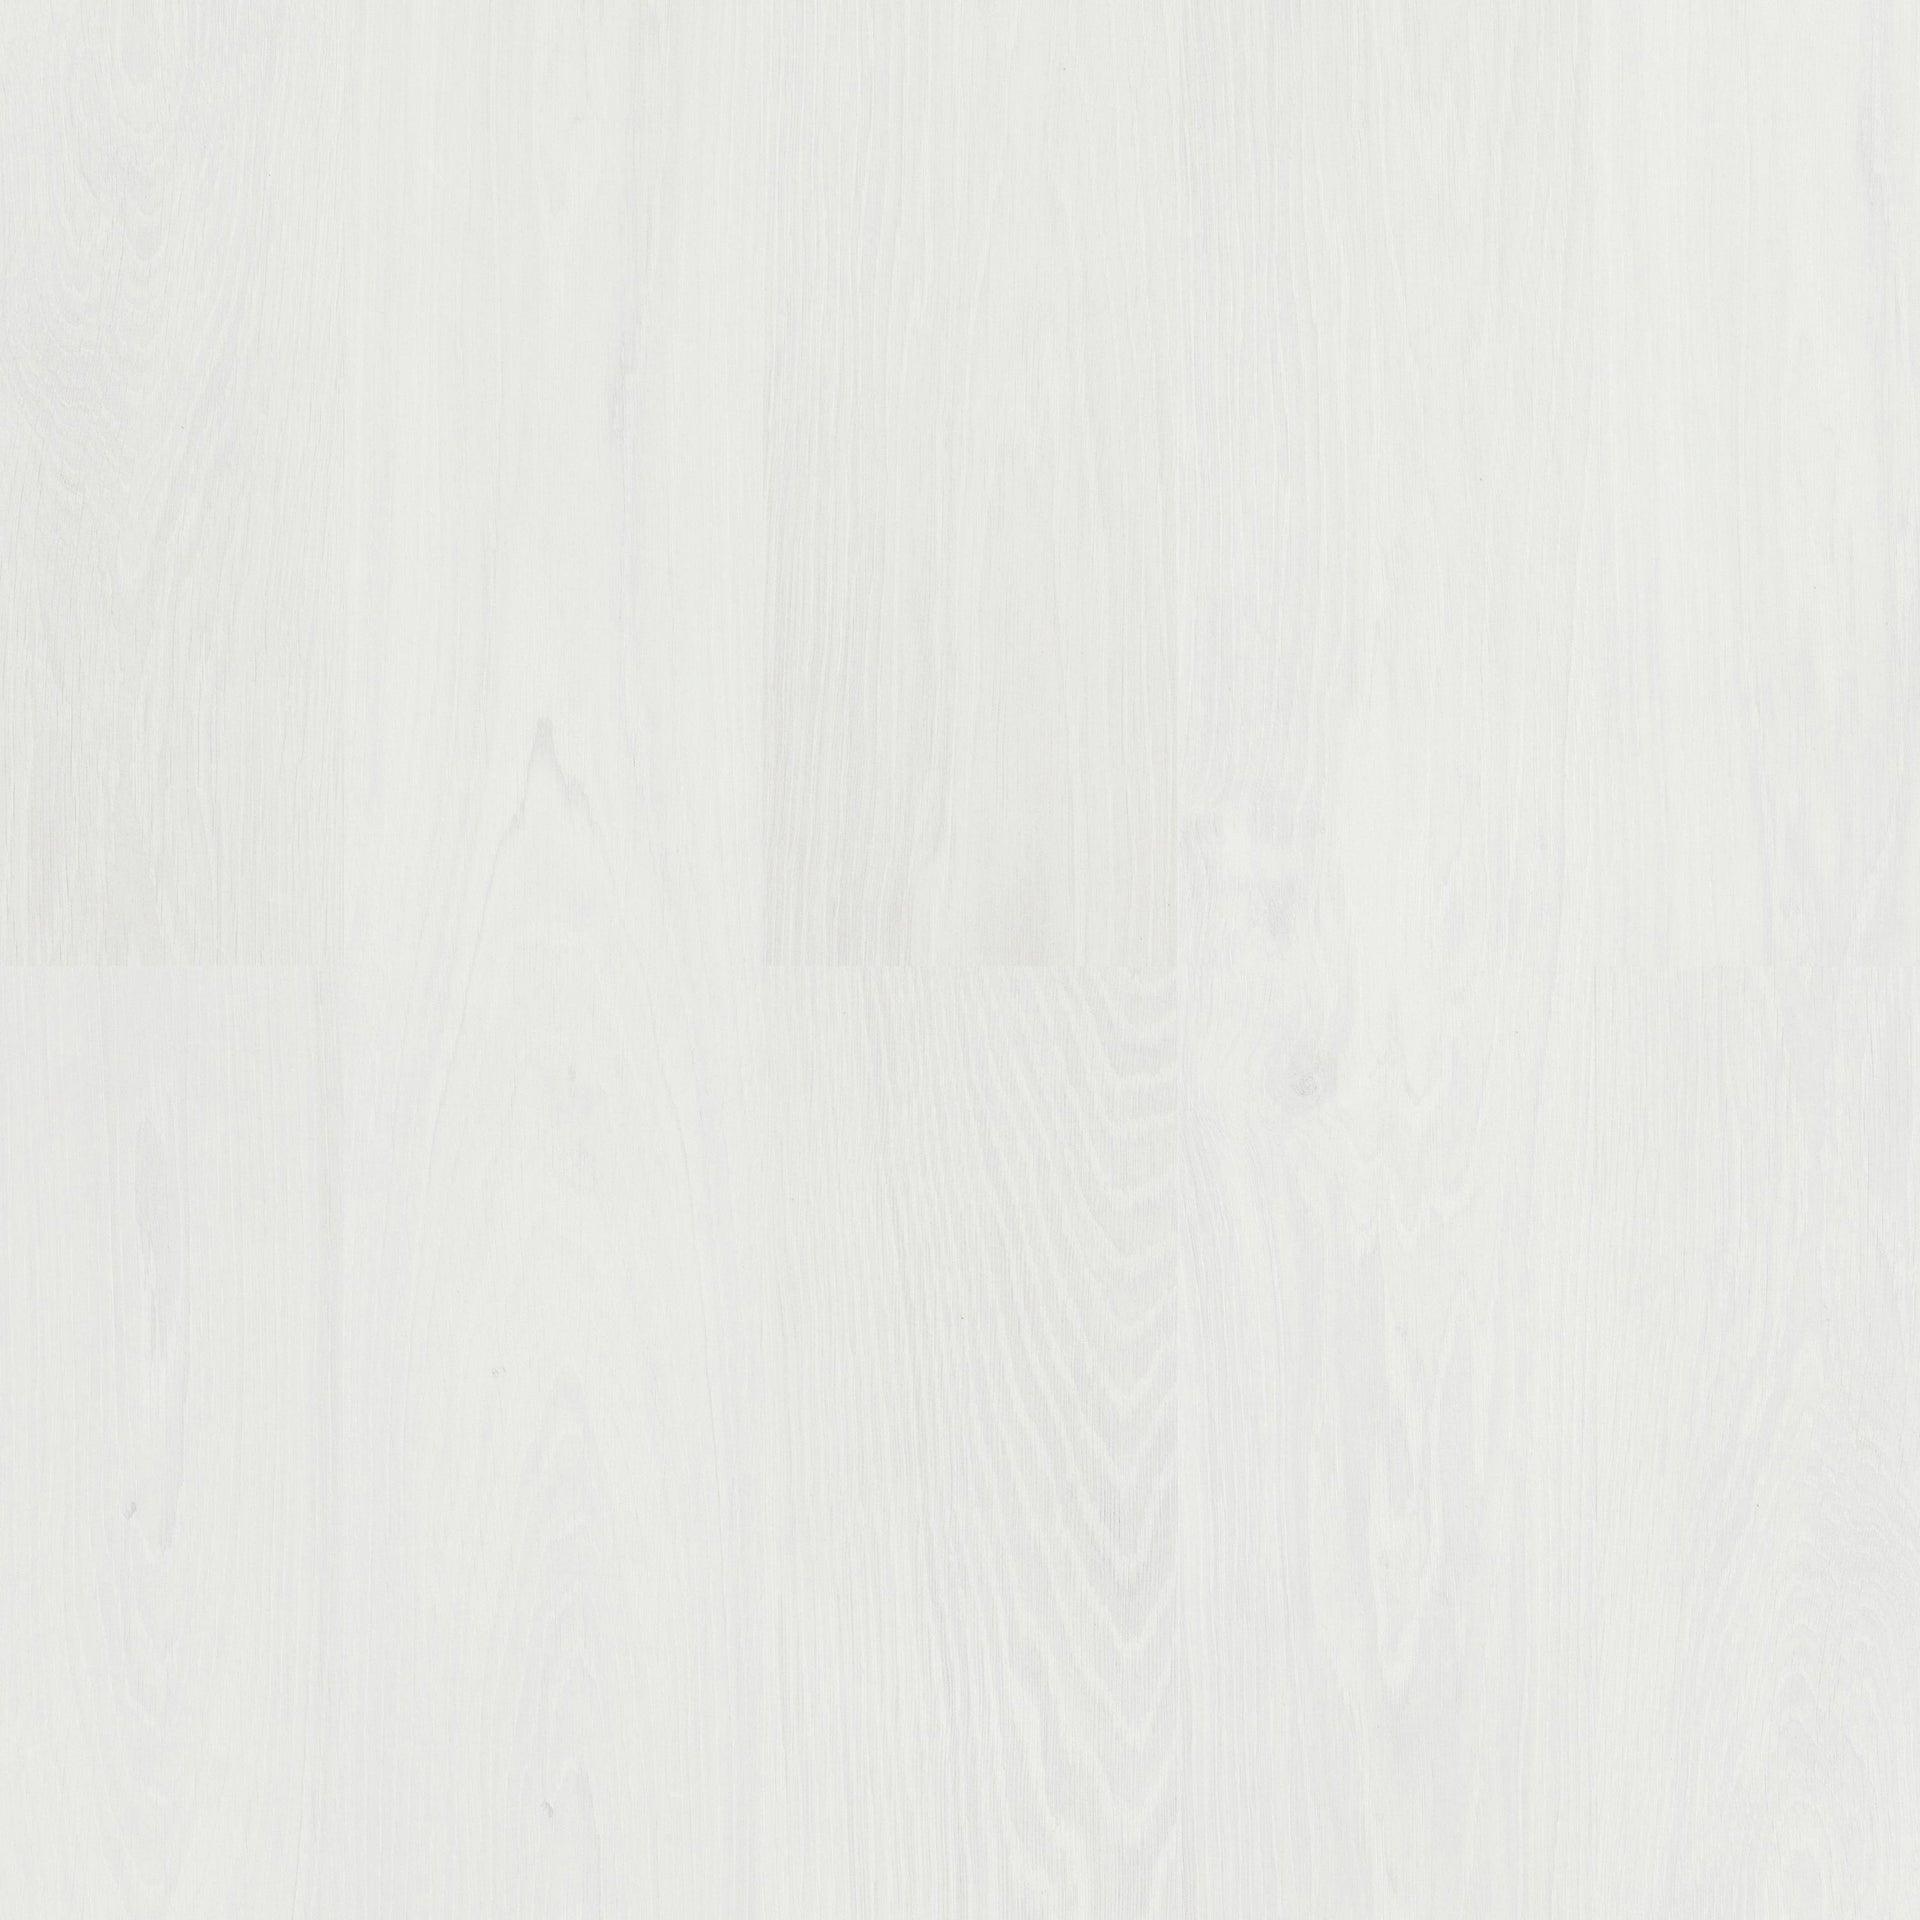 Pavimento laminato Vasa Sp 7 mm bianco - 4